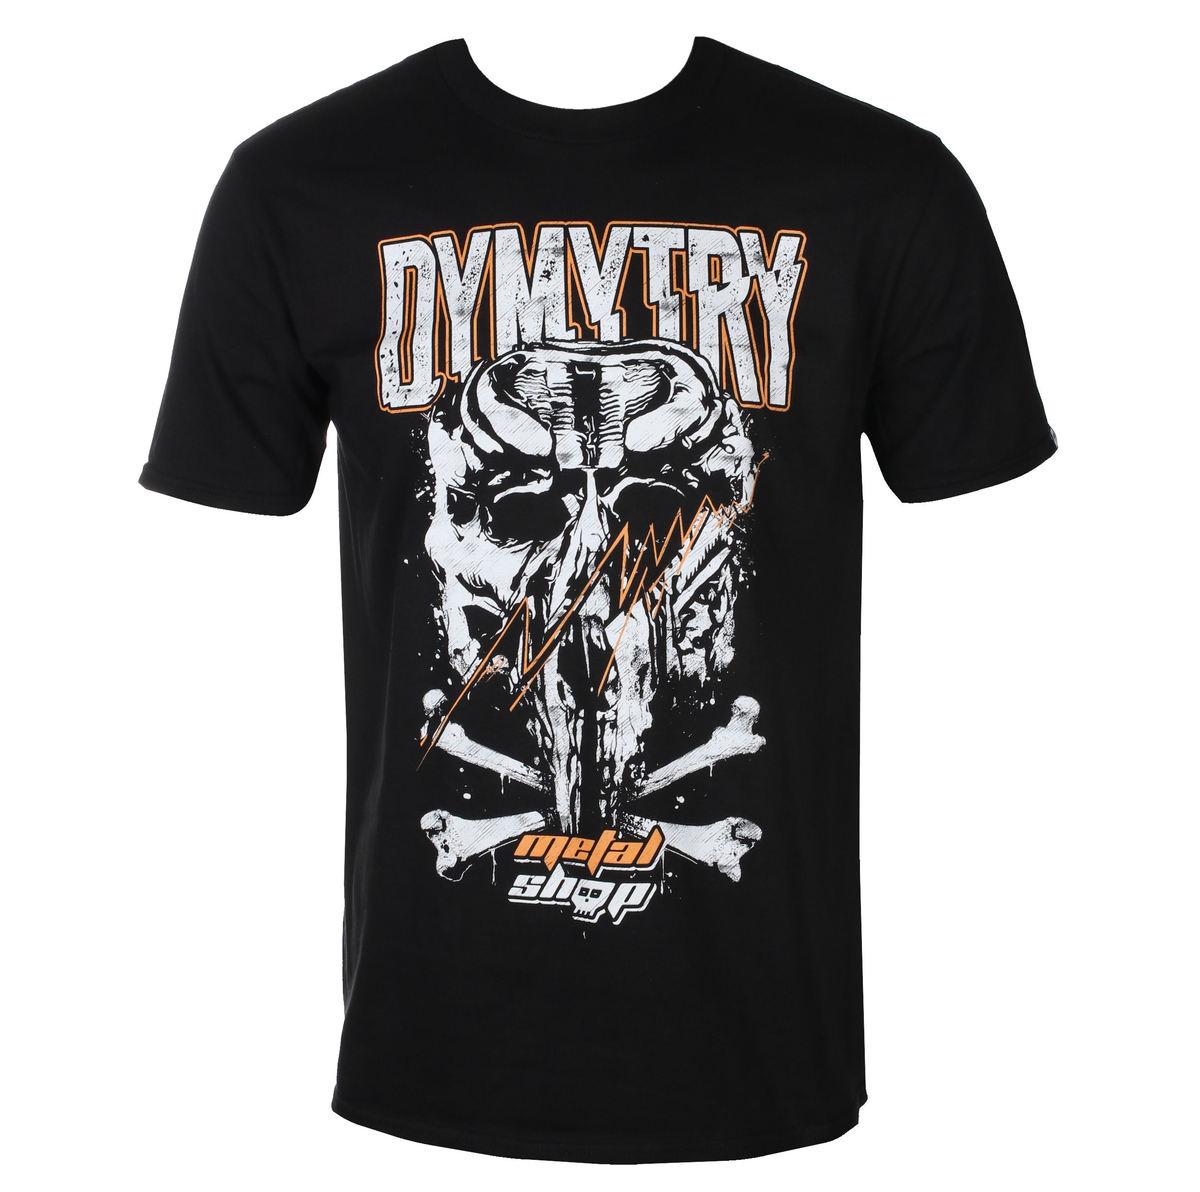 2cff21658d41 tričko pánské METALSHOP x DYMYTRY - MS065 - metalshop.cz